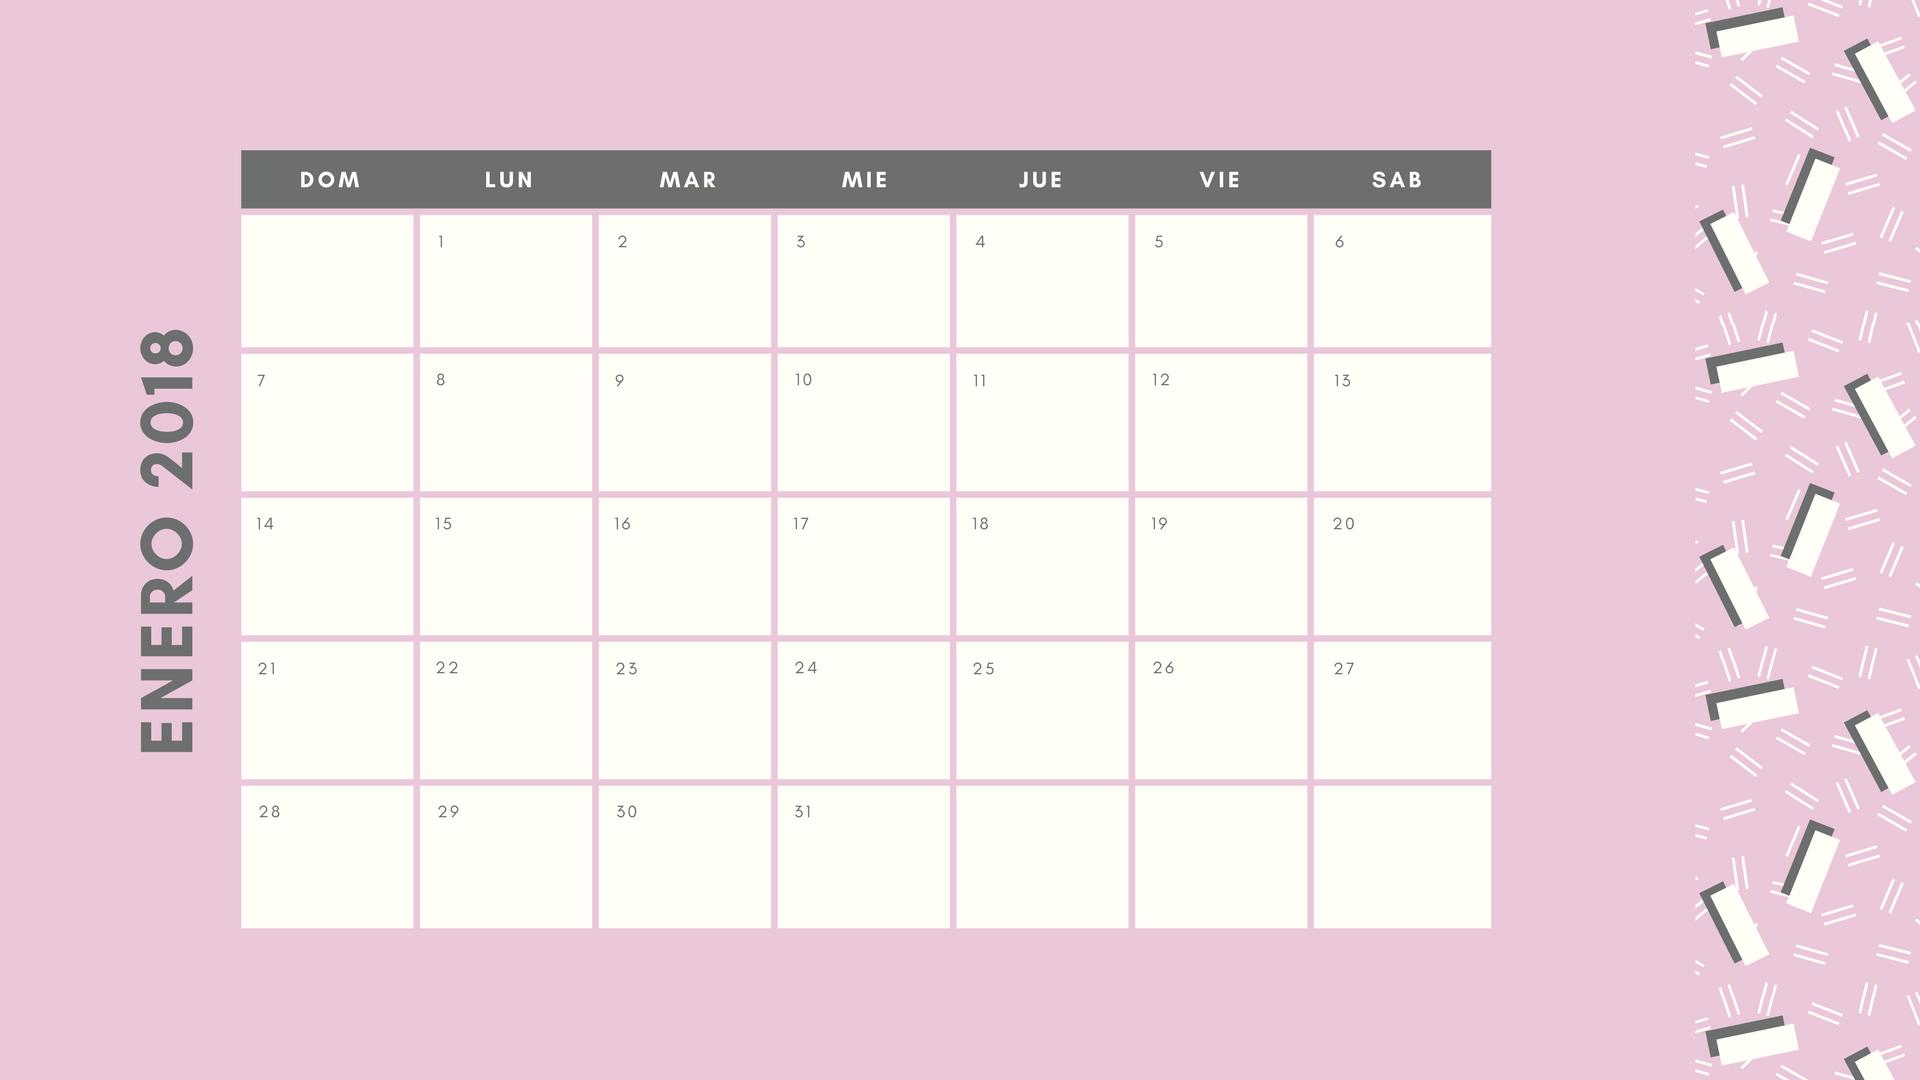 Crea calendarios personalizados online gratis con Canva